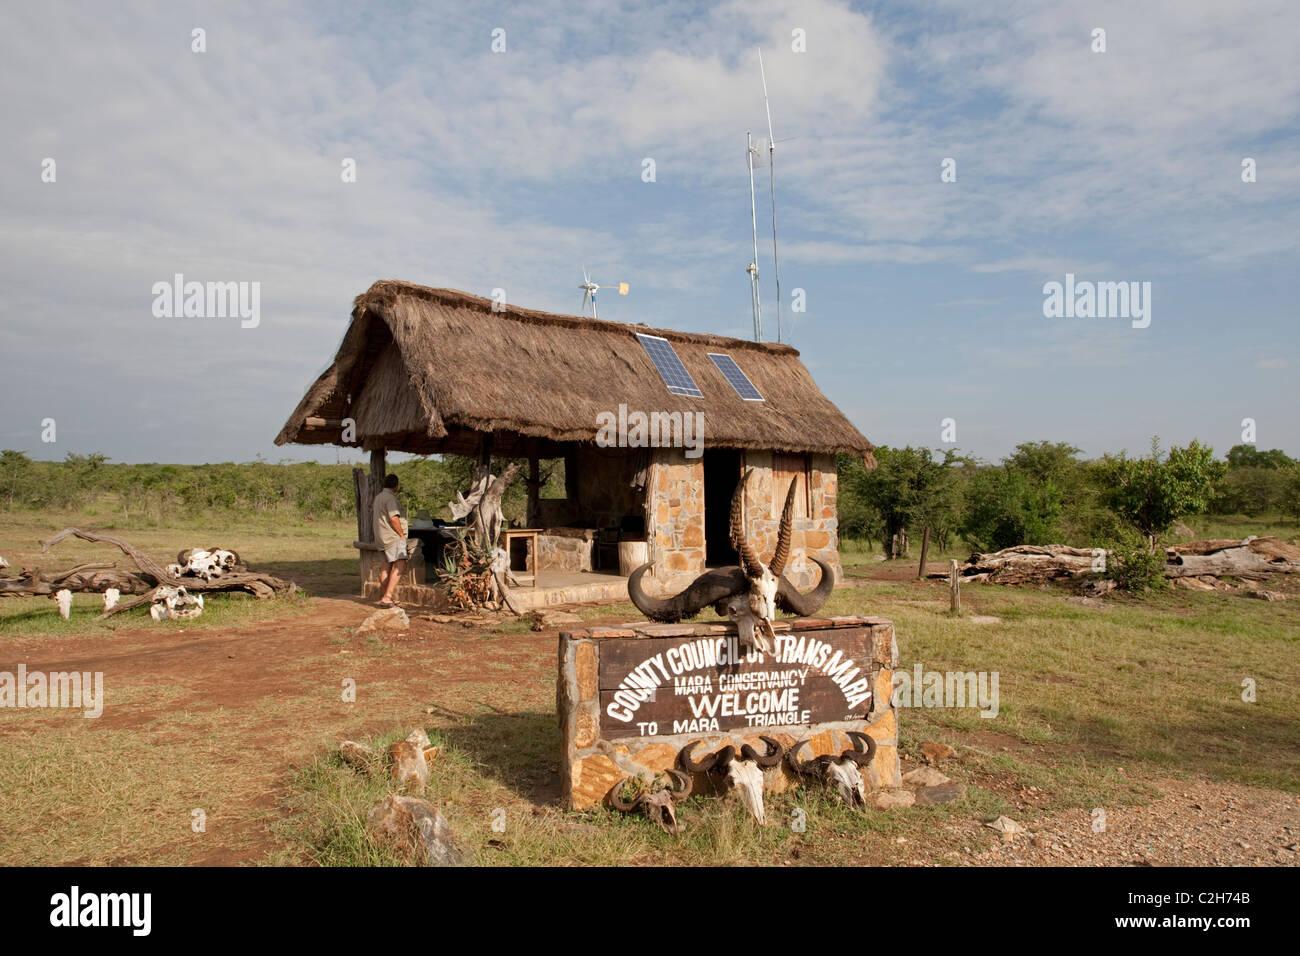 Solar PV panels & wind turbine on thatched roof game reserve entrance Masai Mara Kenya - Stock Image